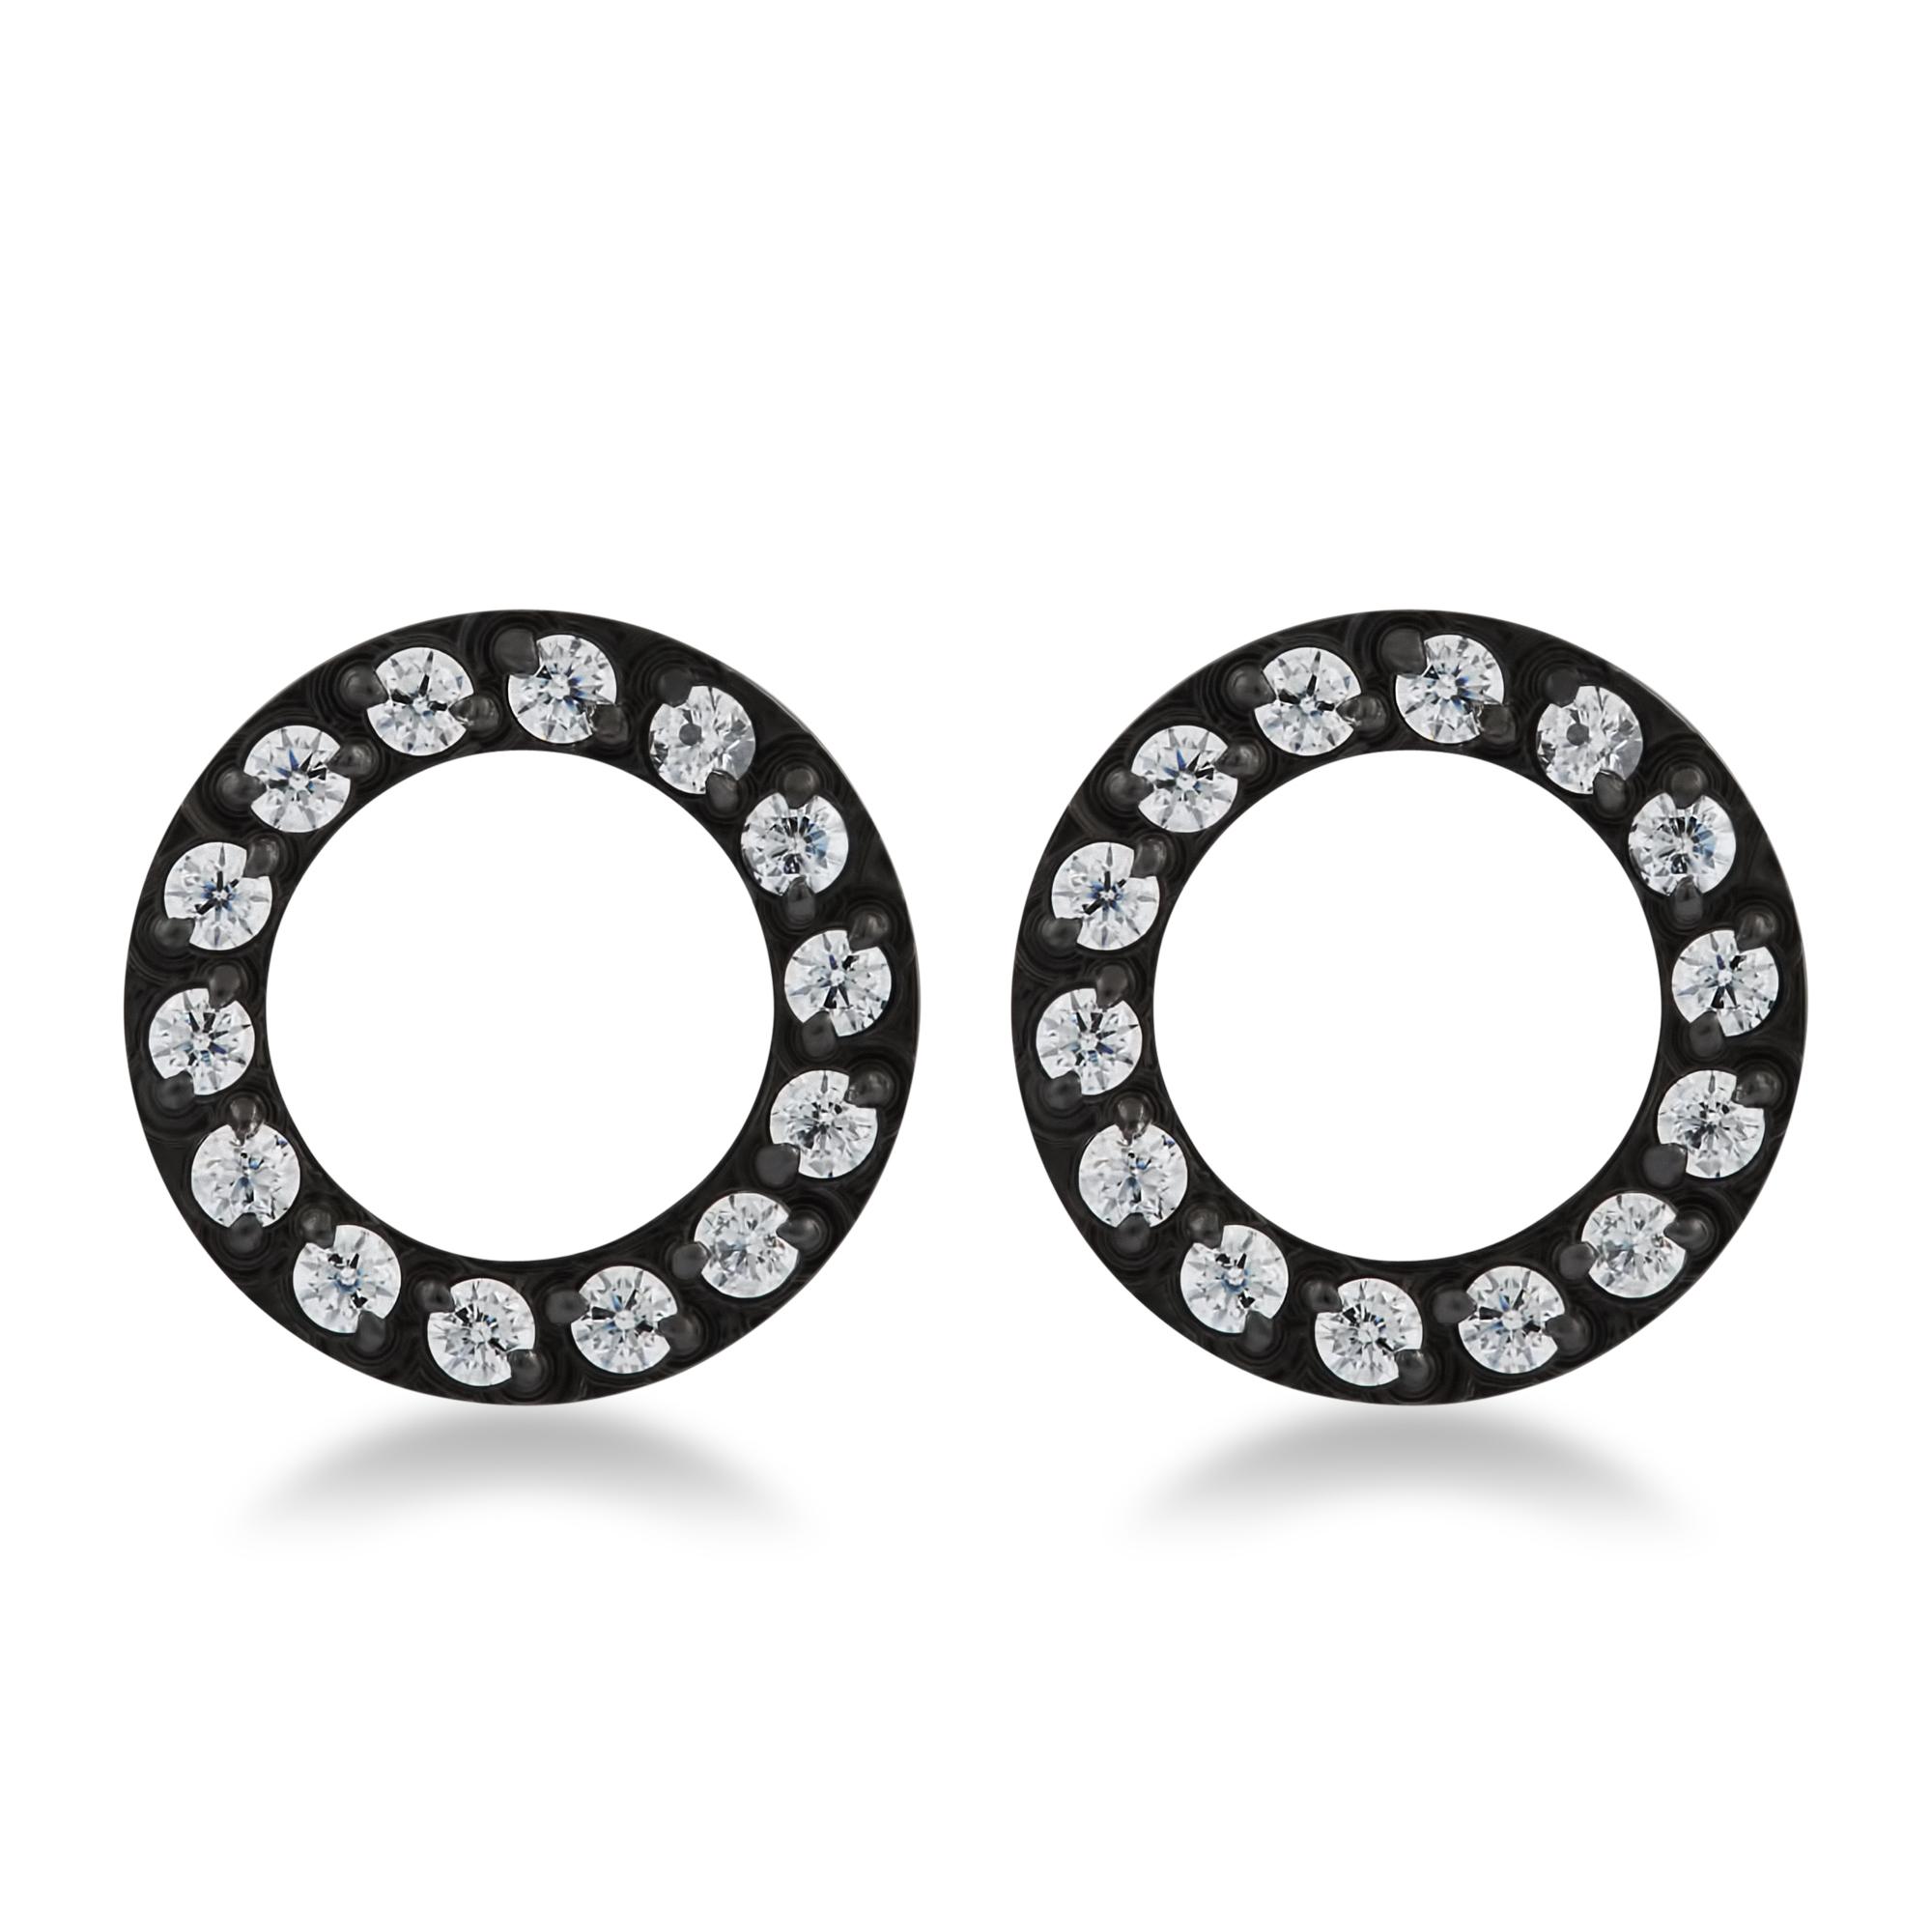 Image of   Kranz & Ziegler Stål ring - 1405102 XS/S